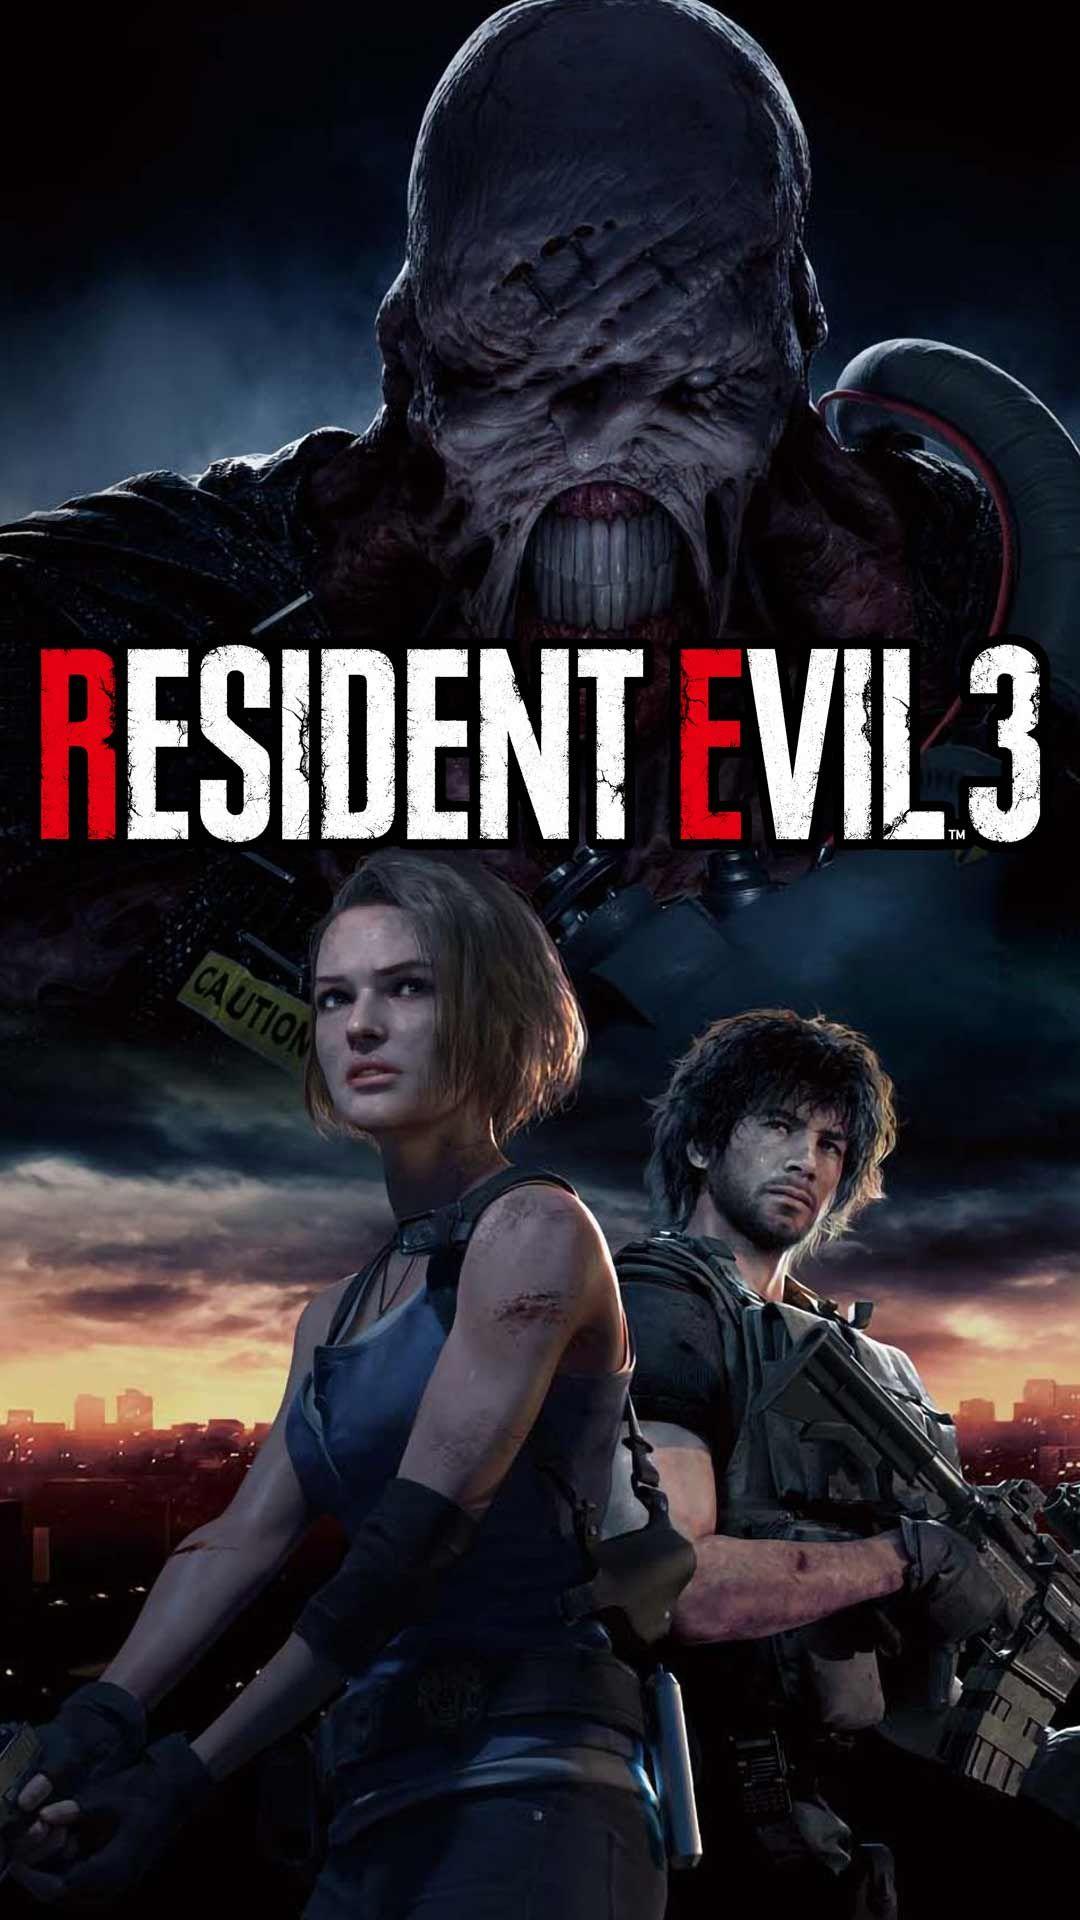 Resident evil 3 remake wallpaper HD phone backgrounds 2020